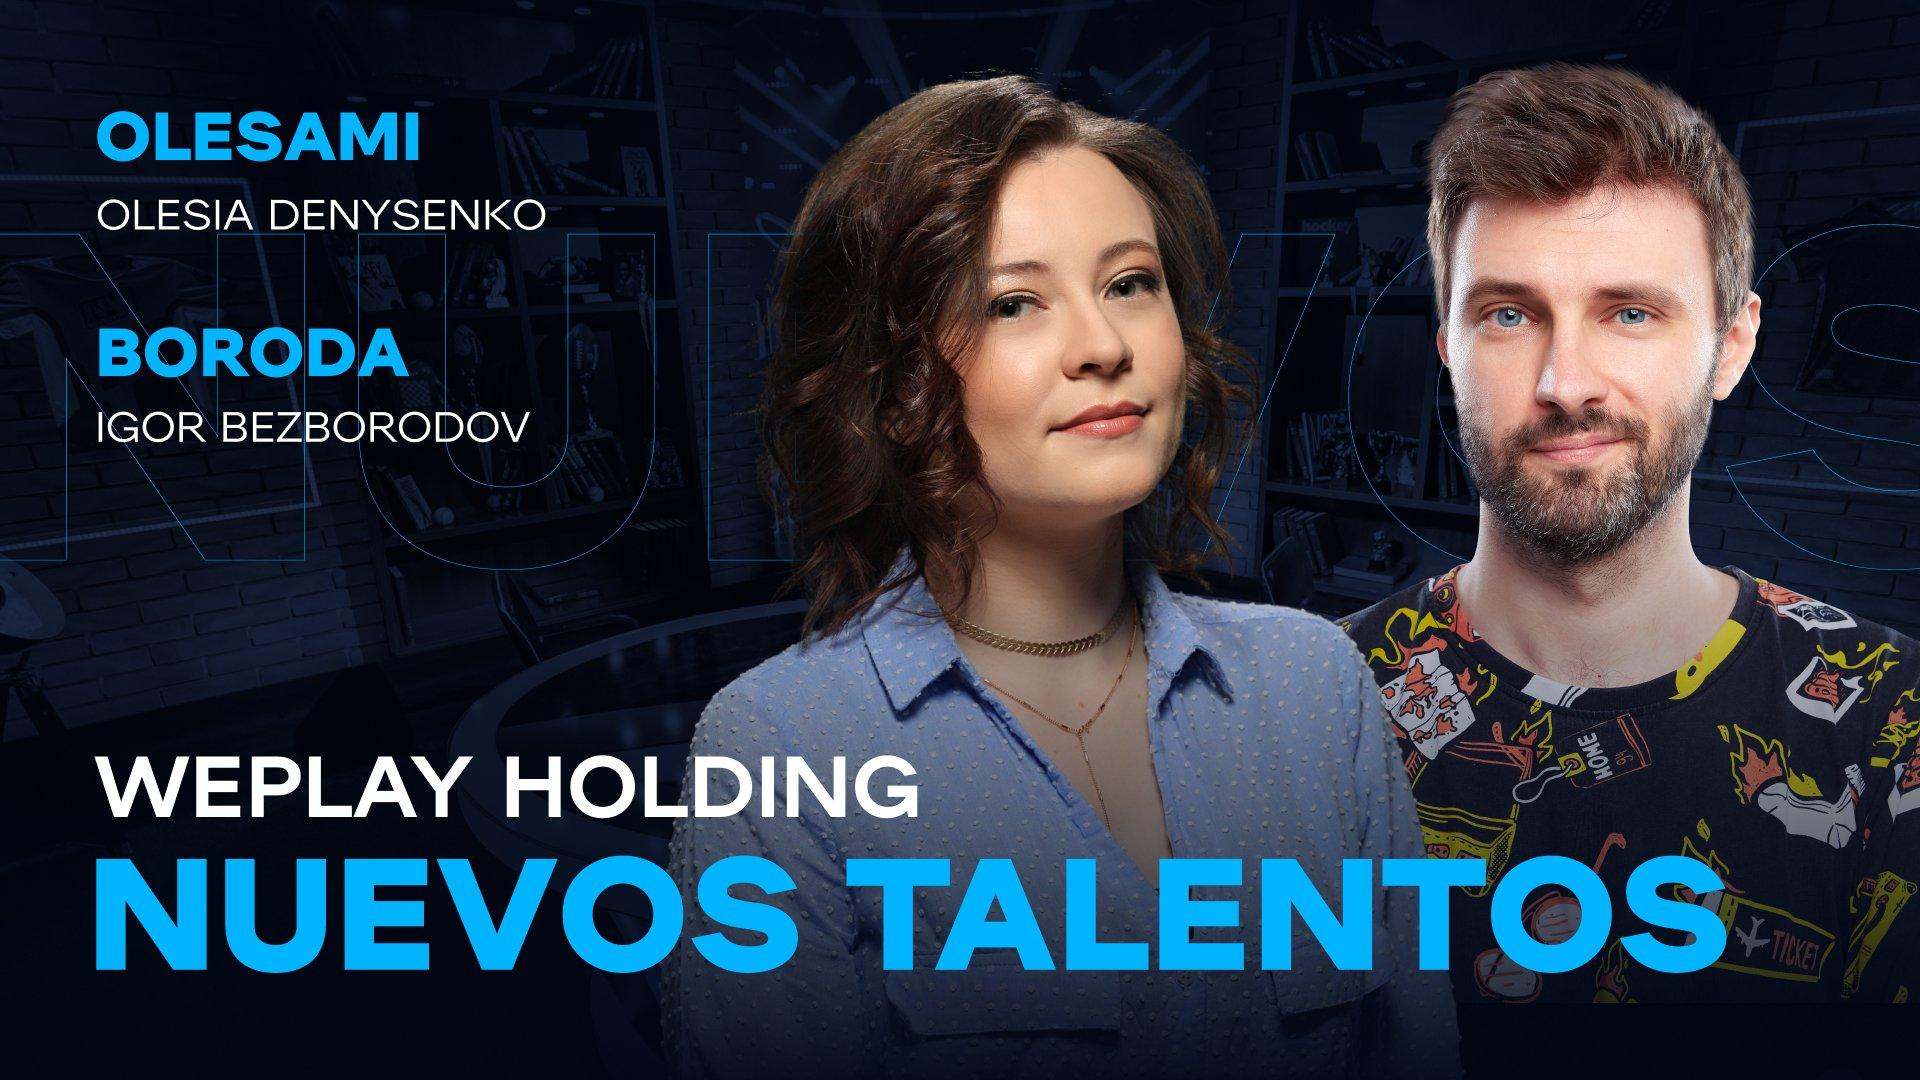 Nuevos talentos de WePlay Holding. Imagen: WePlay Holding